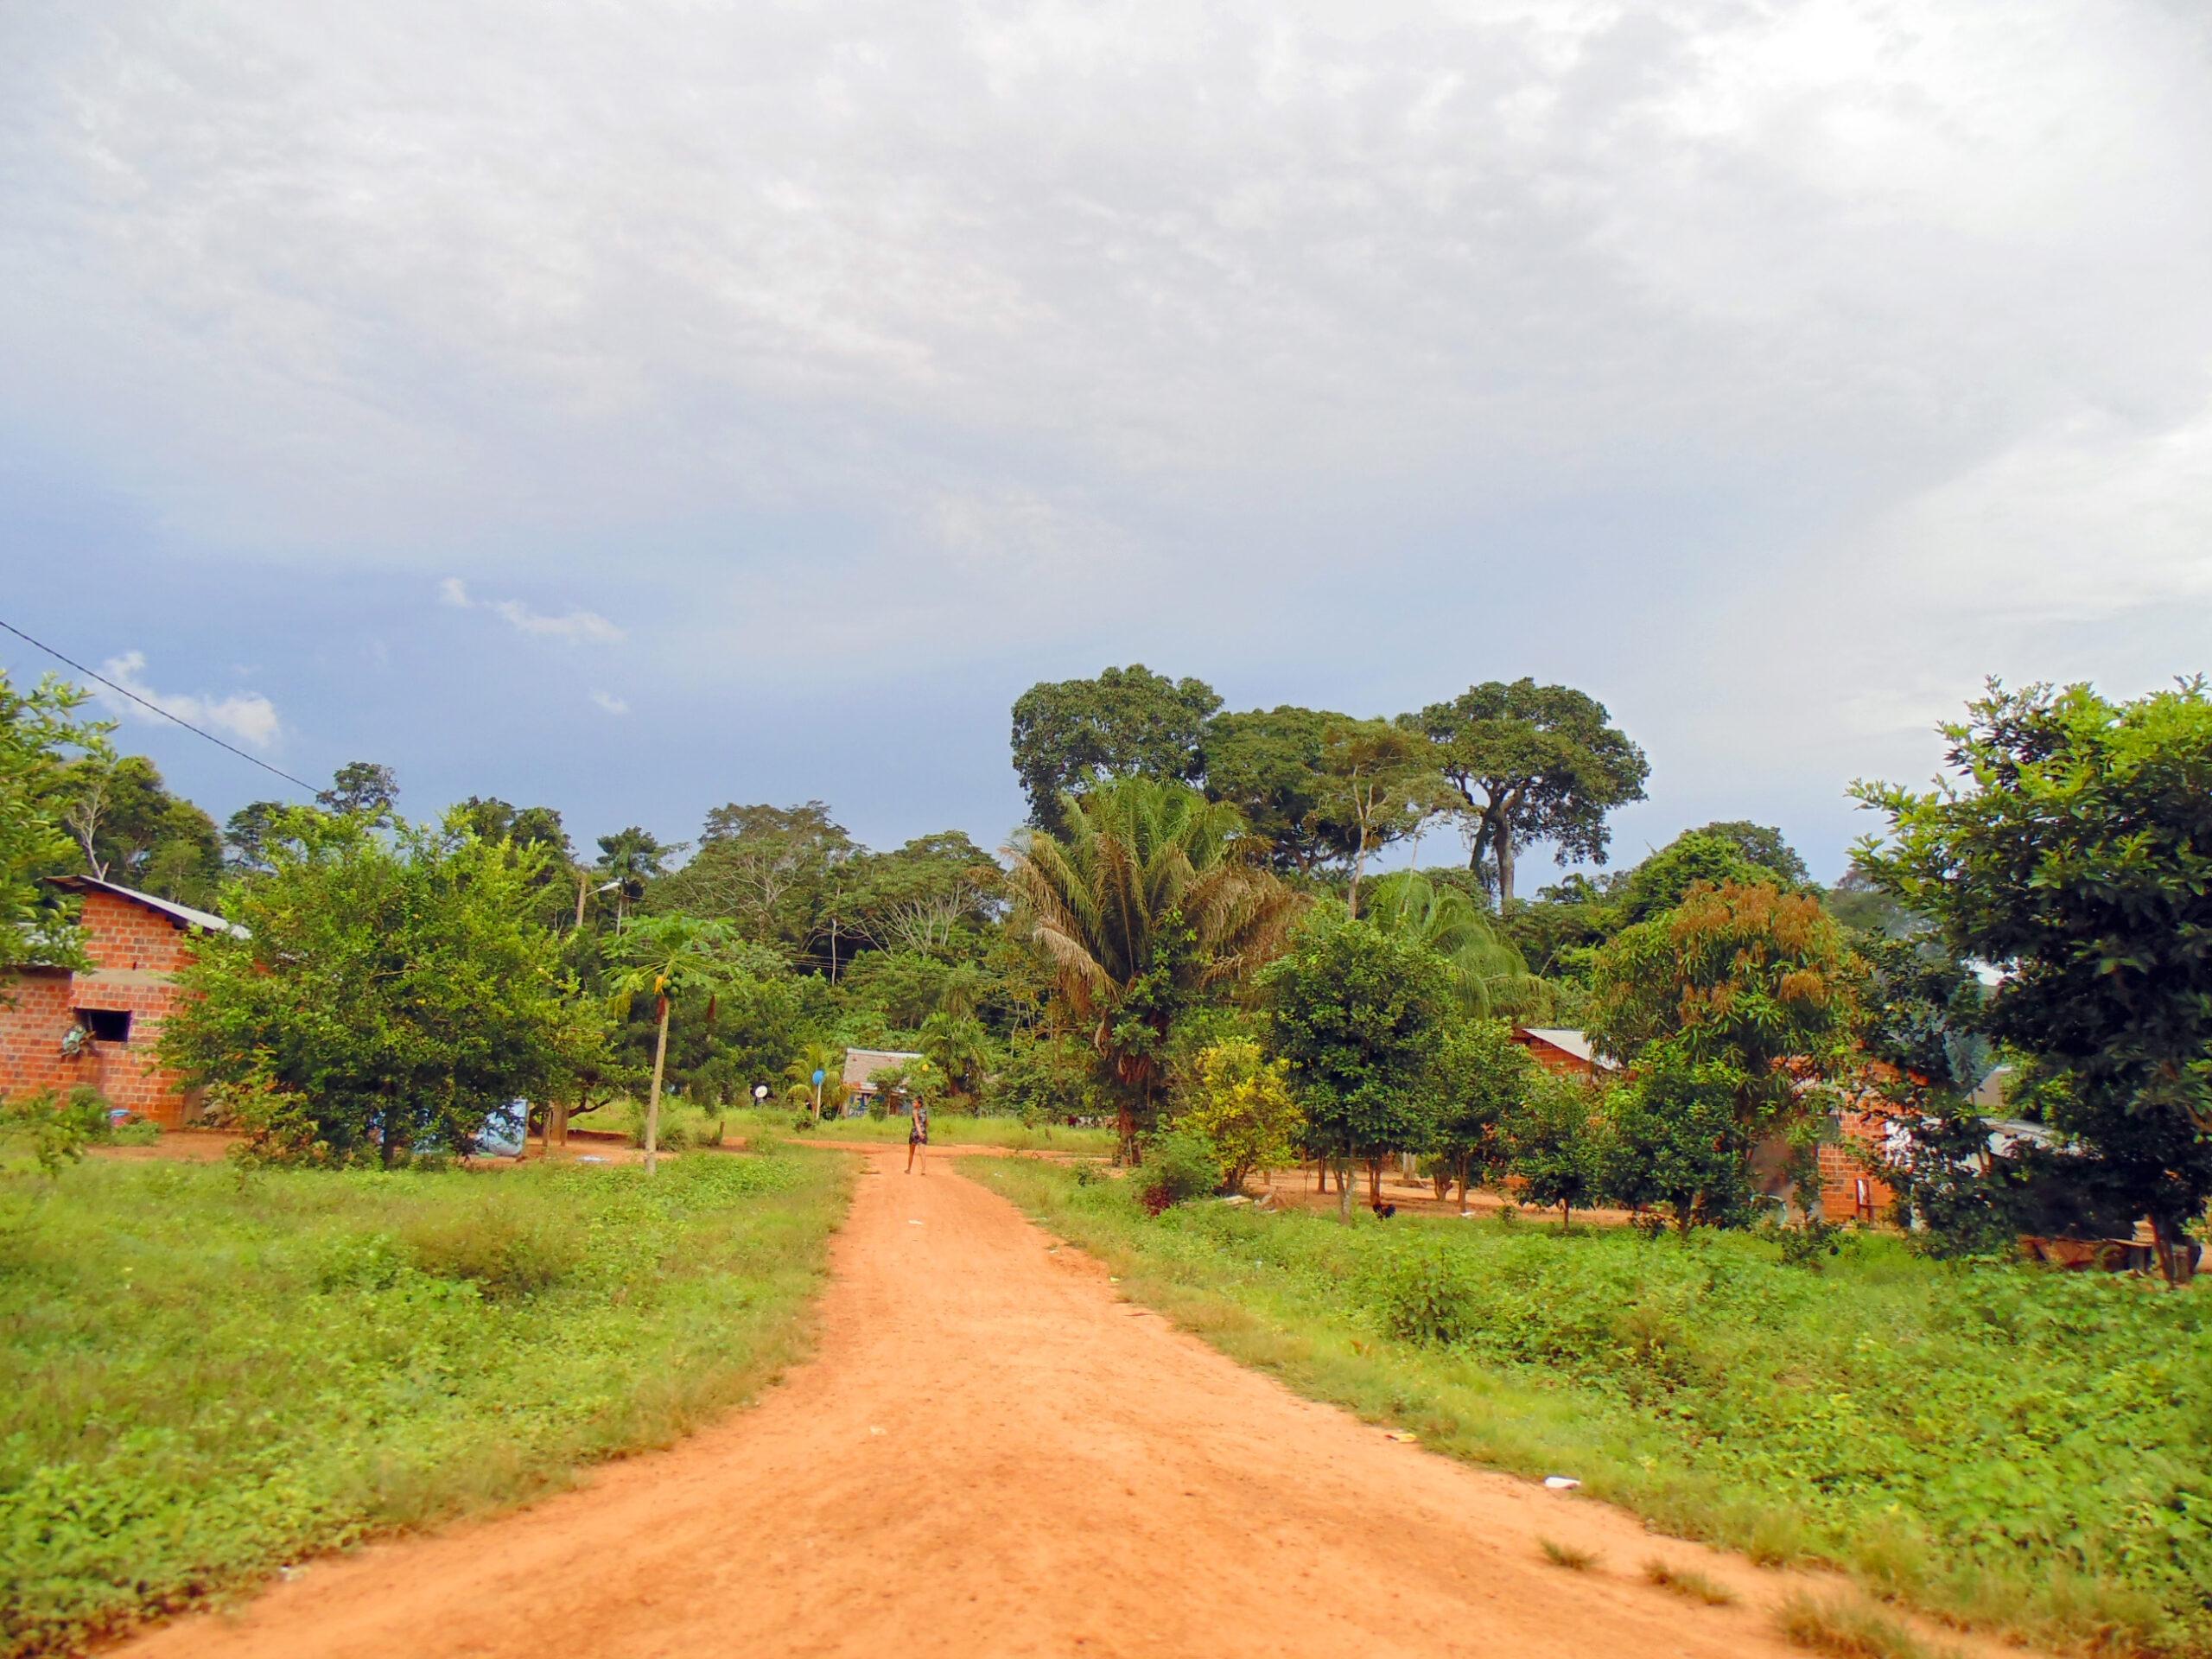 Porvenir protected area